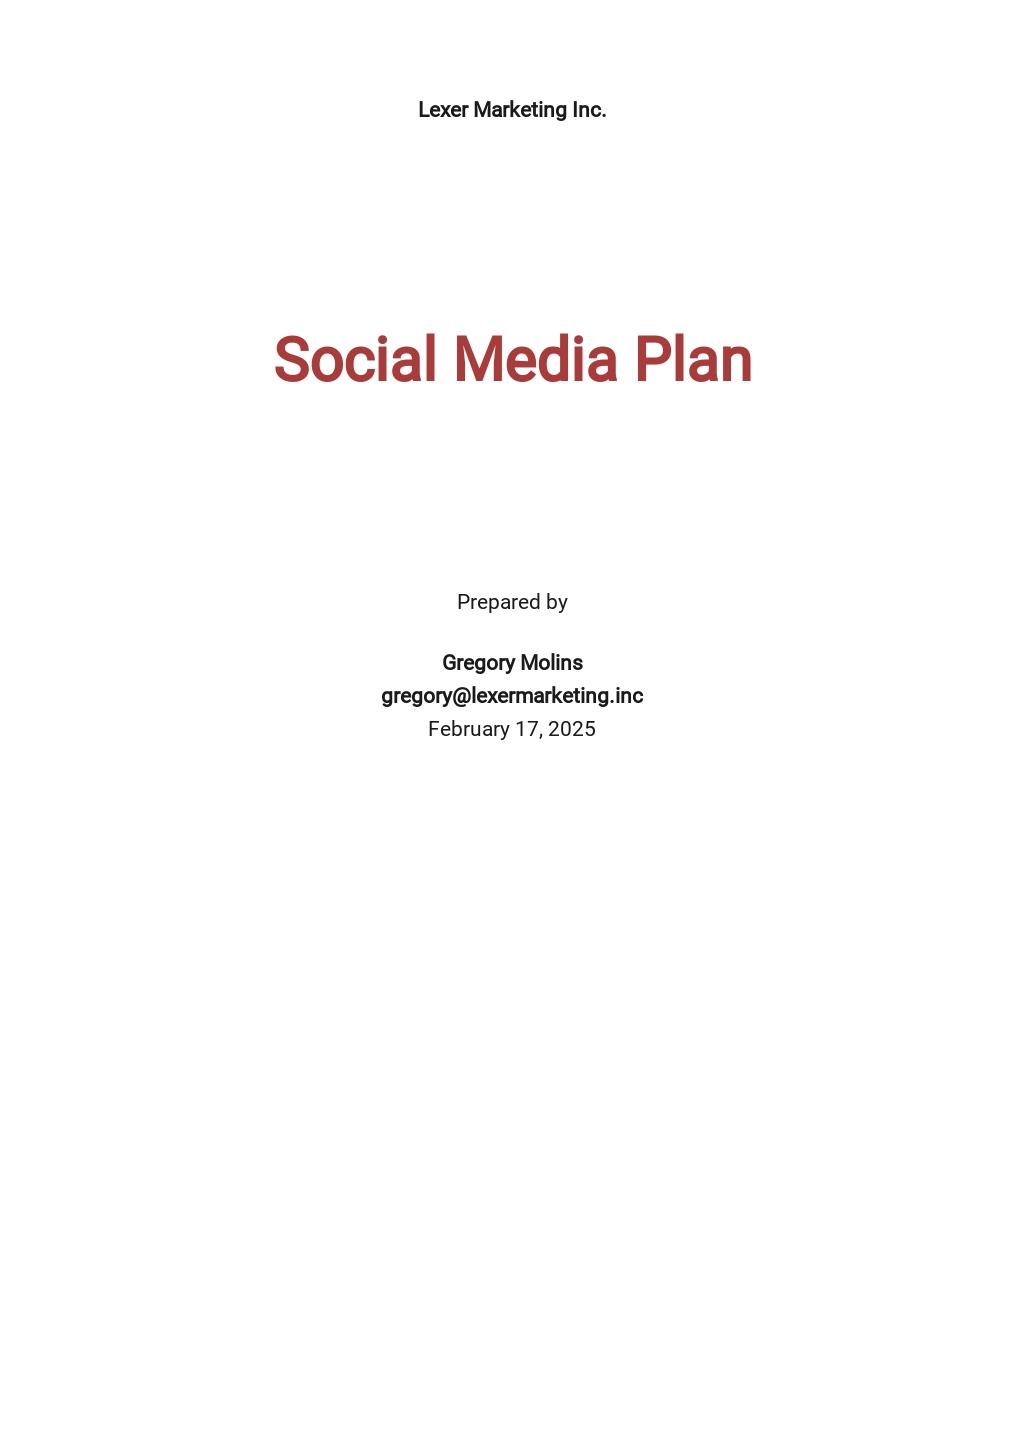 Social Media Plan Template.jpe